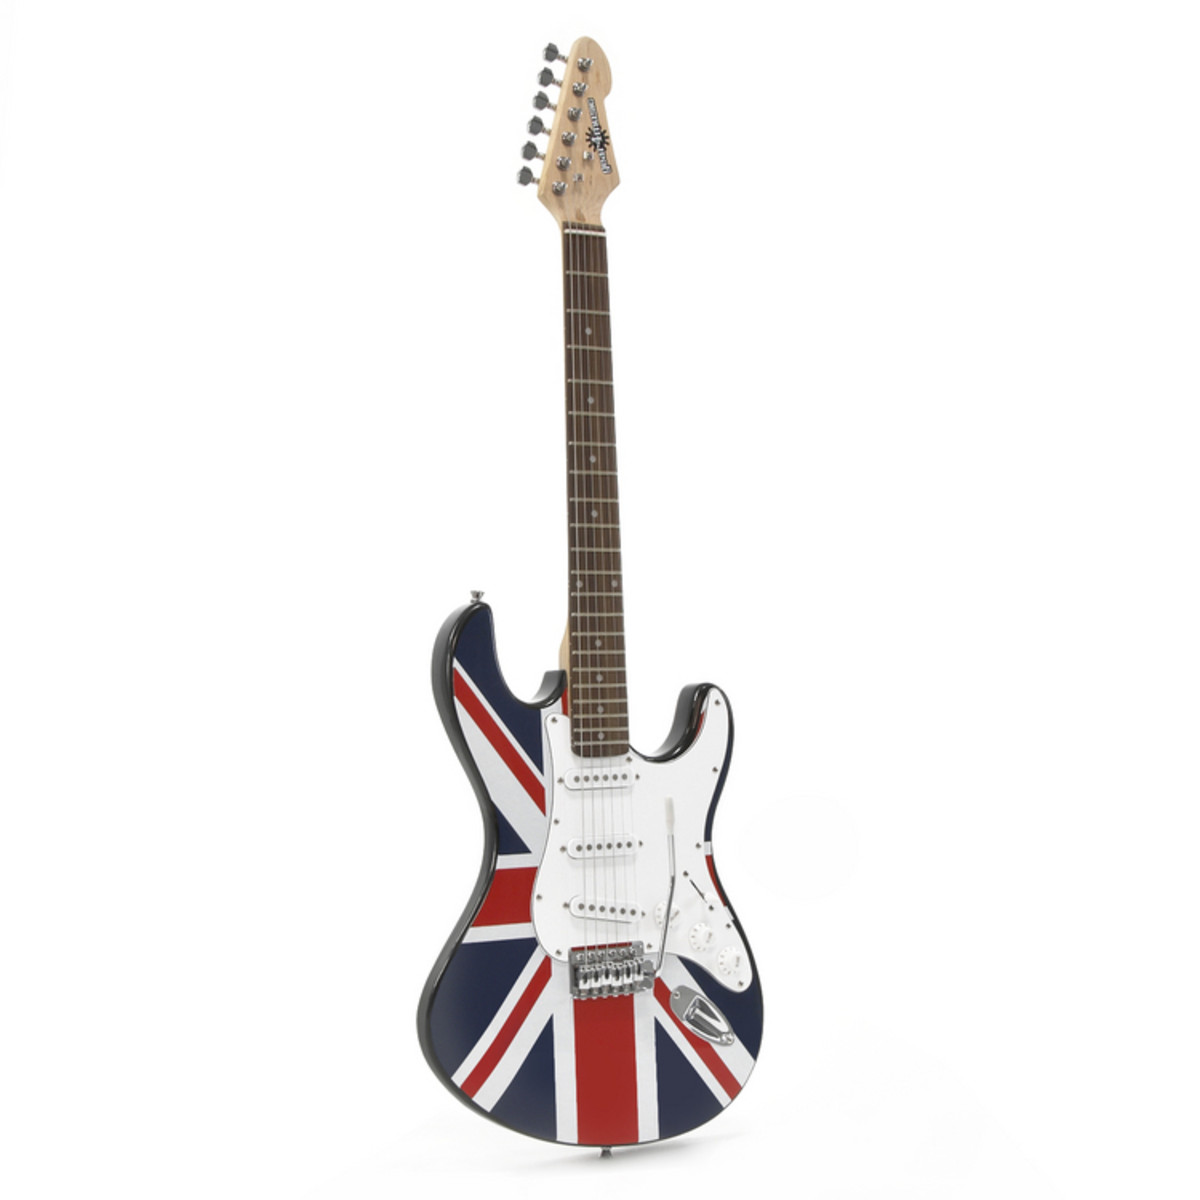 LA-E-Gitarre von Gear4music, Union Jack - Ex Demo bei Gear4music